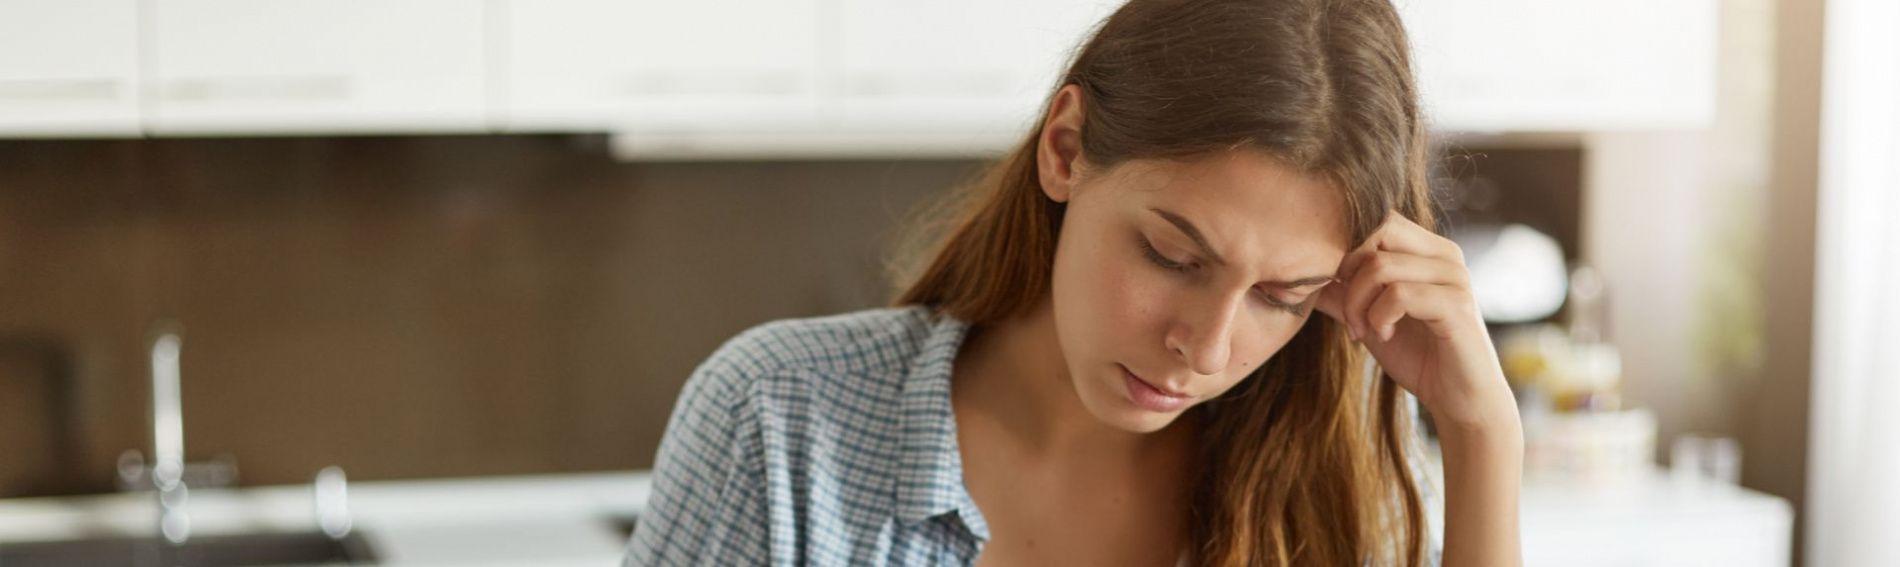 Стресс и синдром раздраженного кишечника